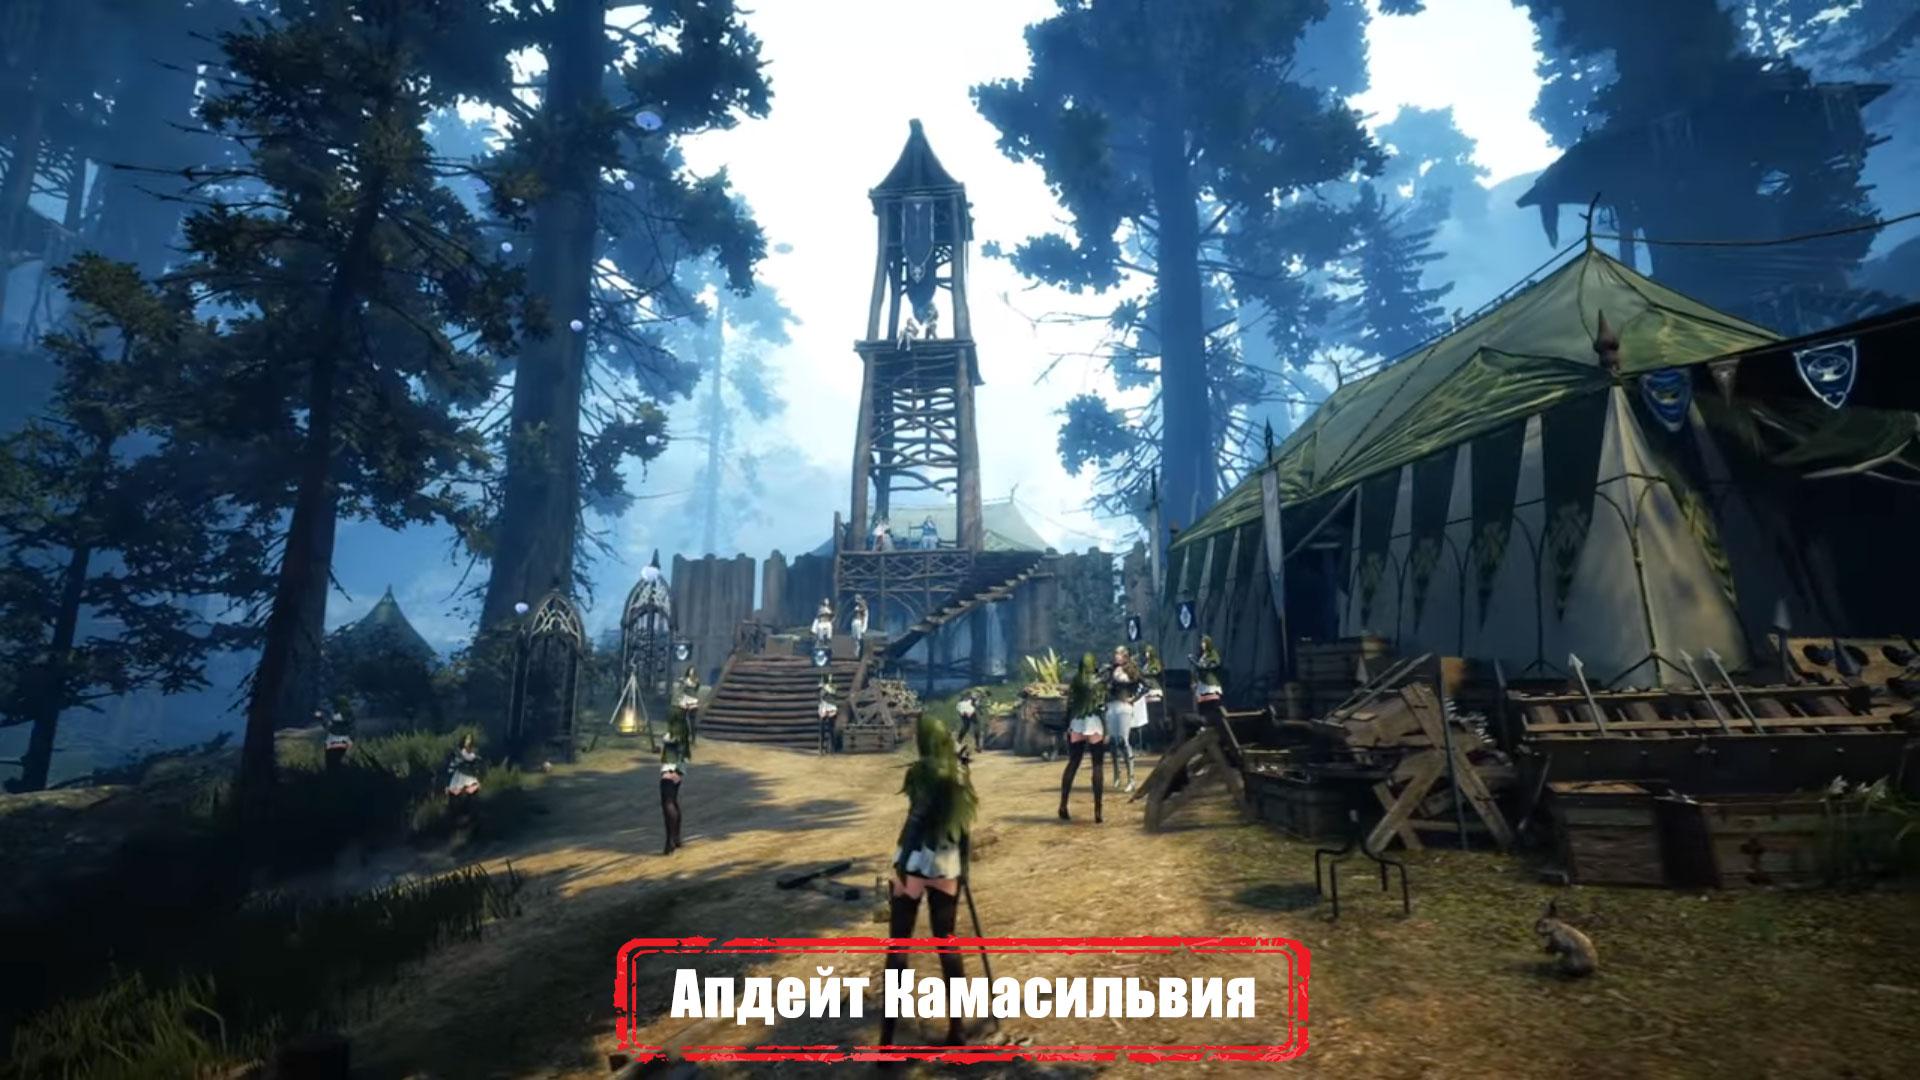 Black Desert готовится к апдейту «Камасильвия»